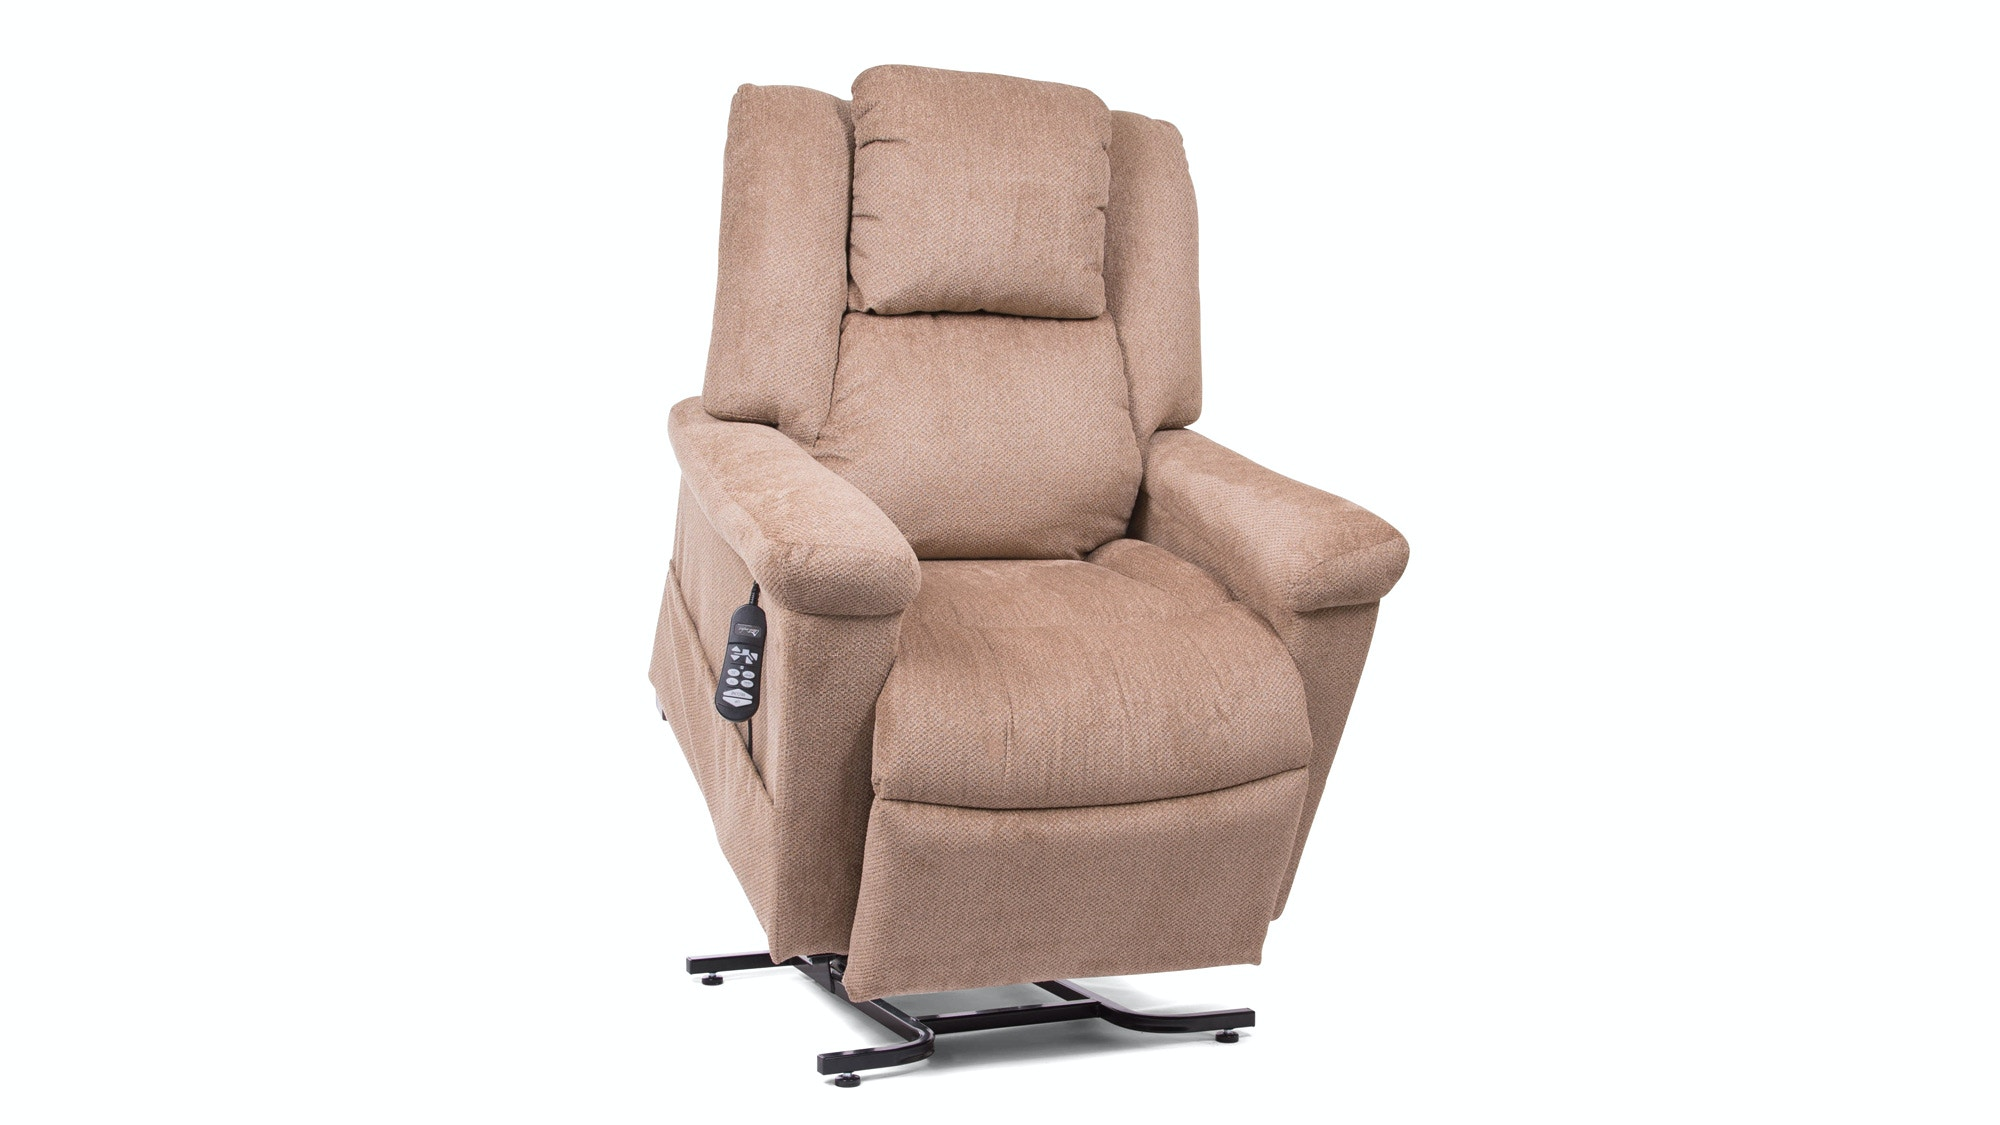 Ordinaire Ultra Comfort Lift Chair With Power Headrest 783058